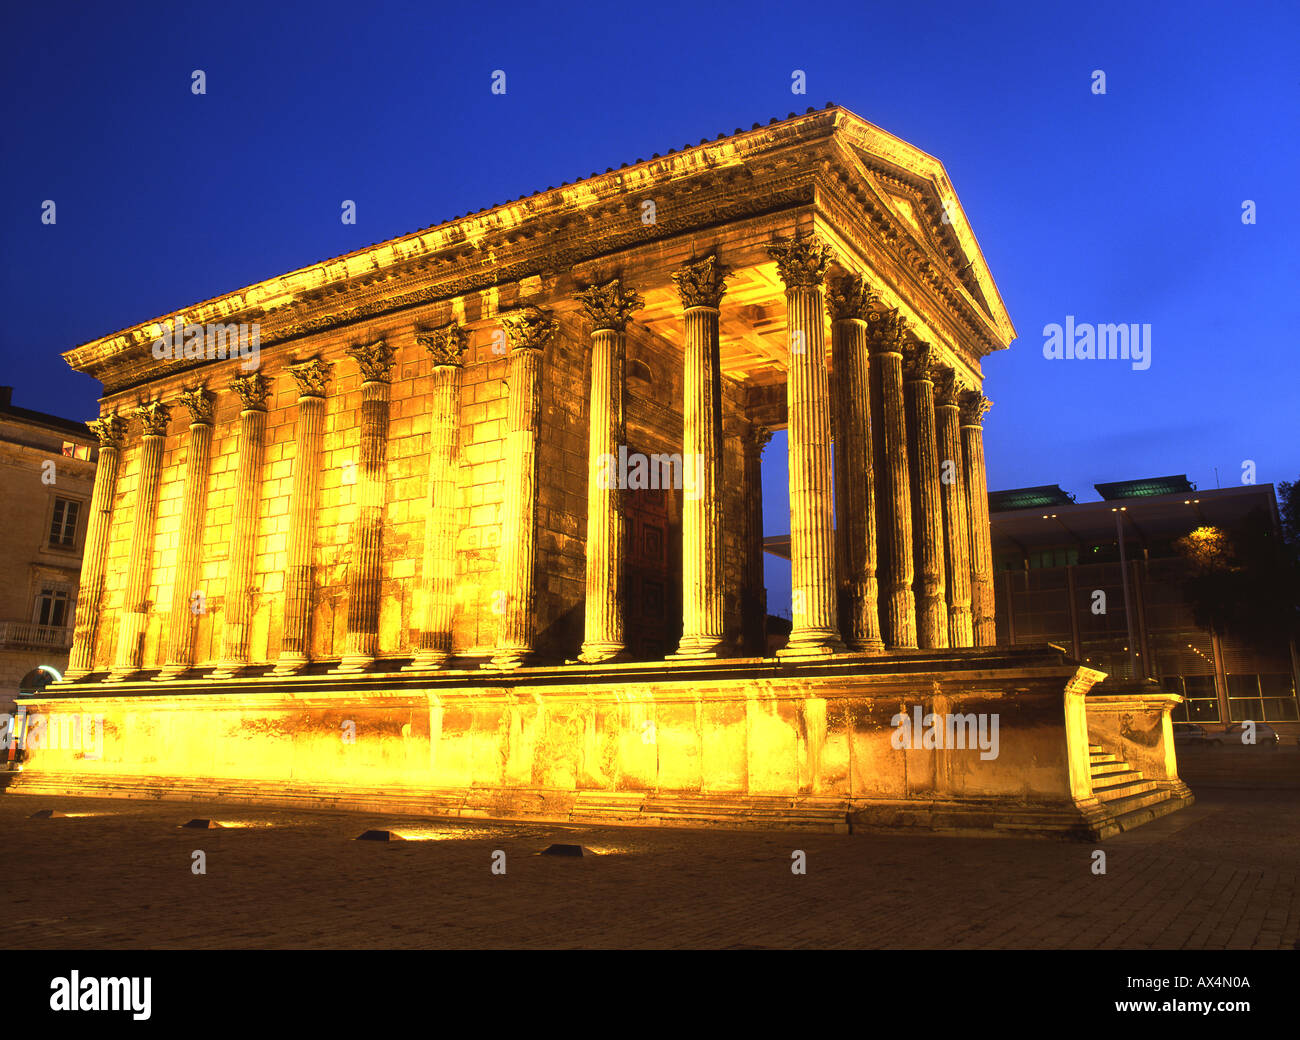 La Maison Carrée II secolo d.c. tempio romano di notte Carrée d'Art Museum di Norman Foster Nimes Languedoc Rousillon & Francia Immagini Stock